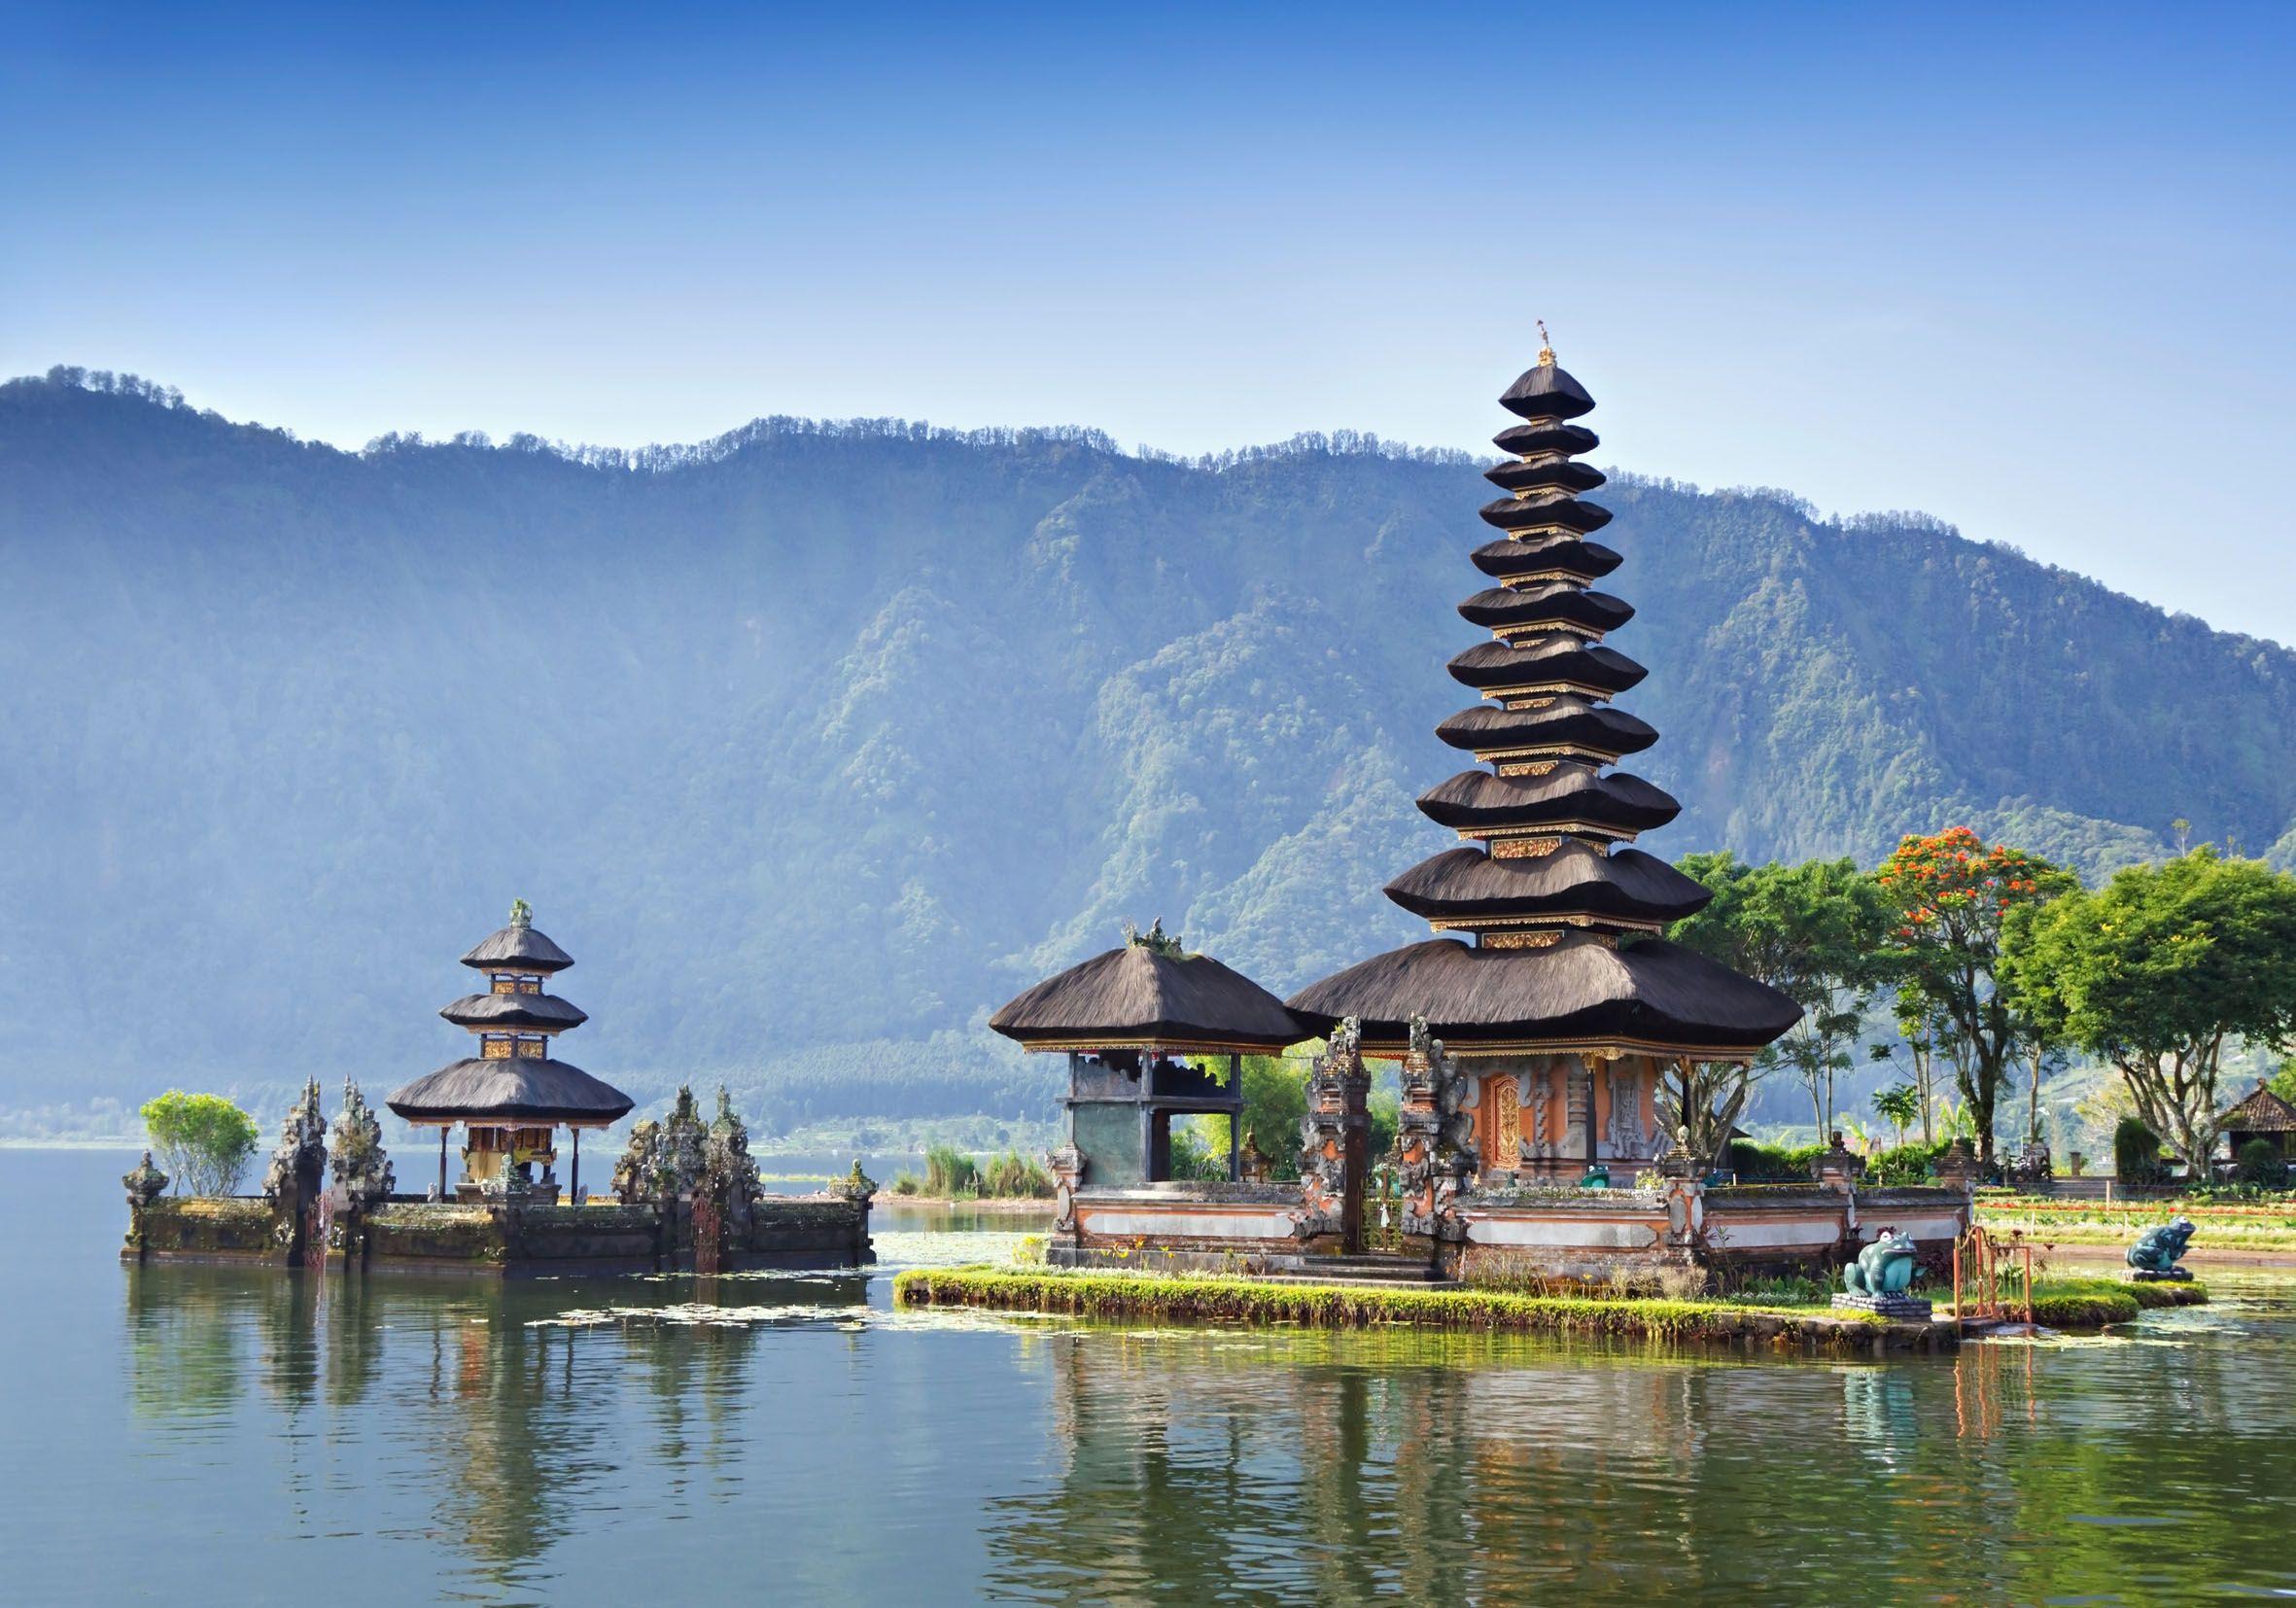 http://vietnamtravelrv.com/images/nuandalab/combinados/viet+Bali/Bali-Temple.jpg